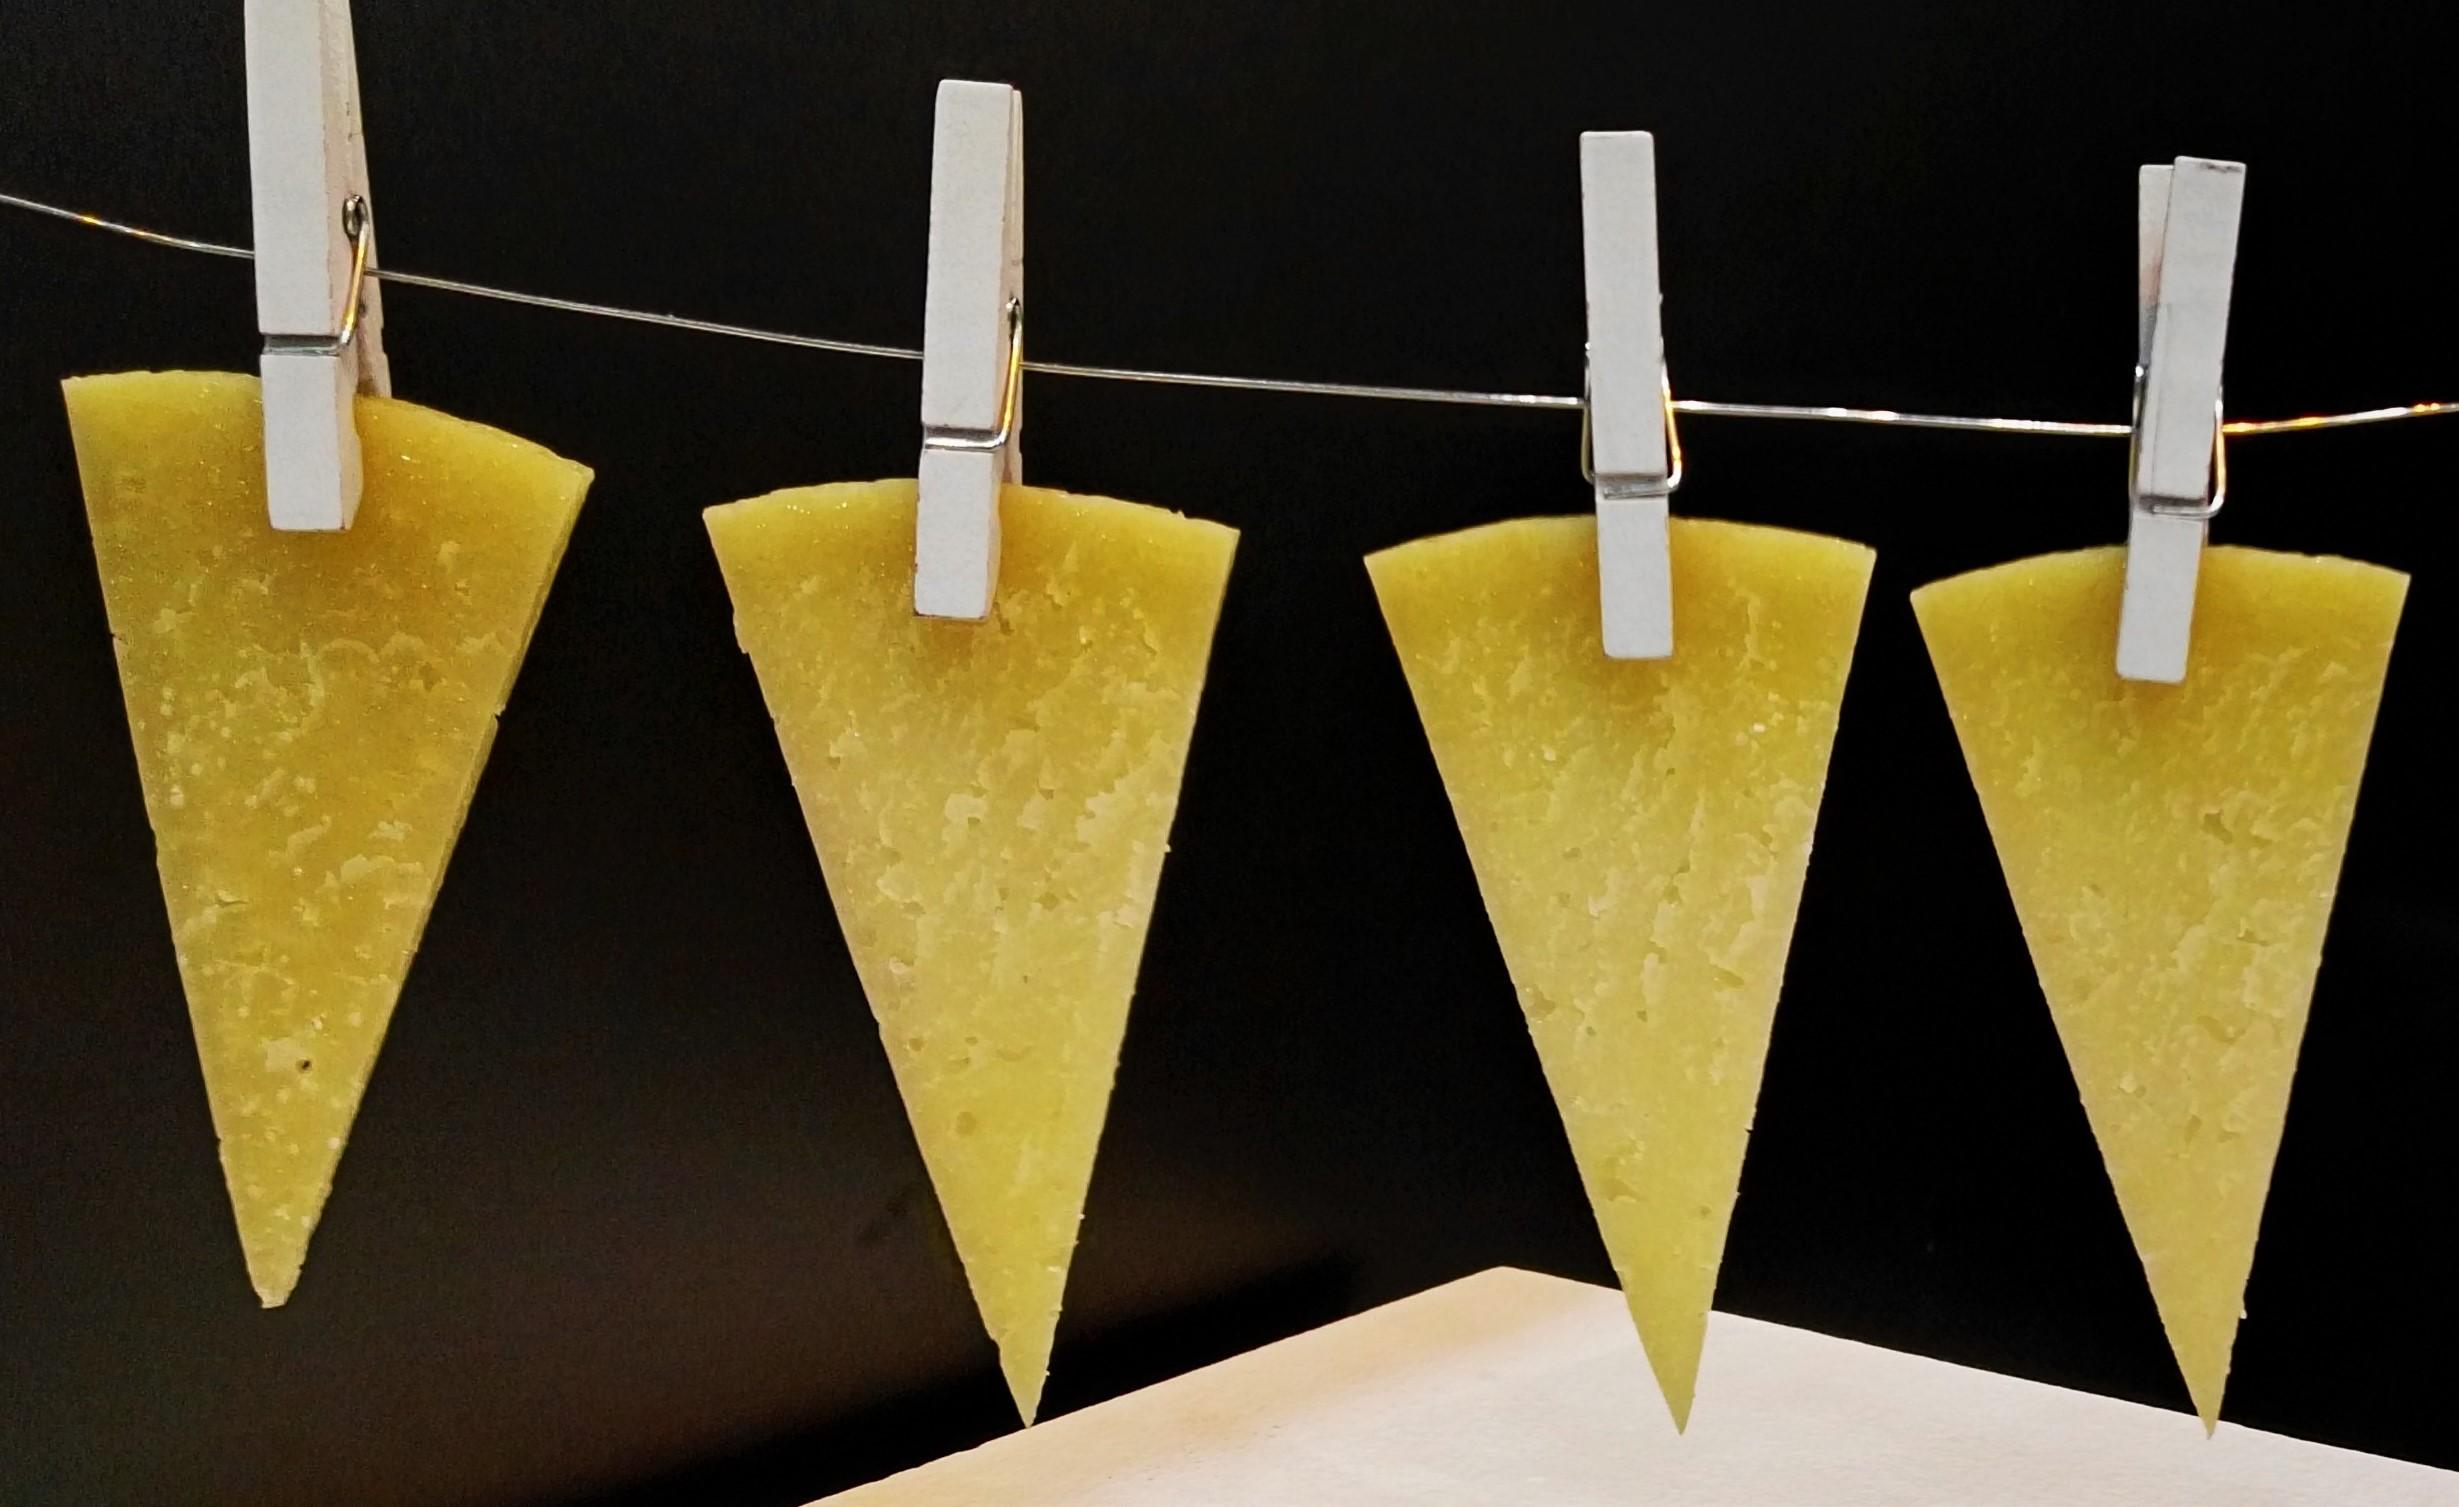 hosteleria-restaurantes-queso-horeca